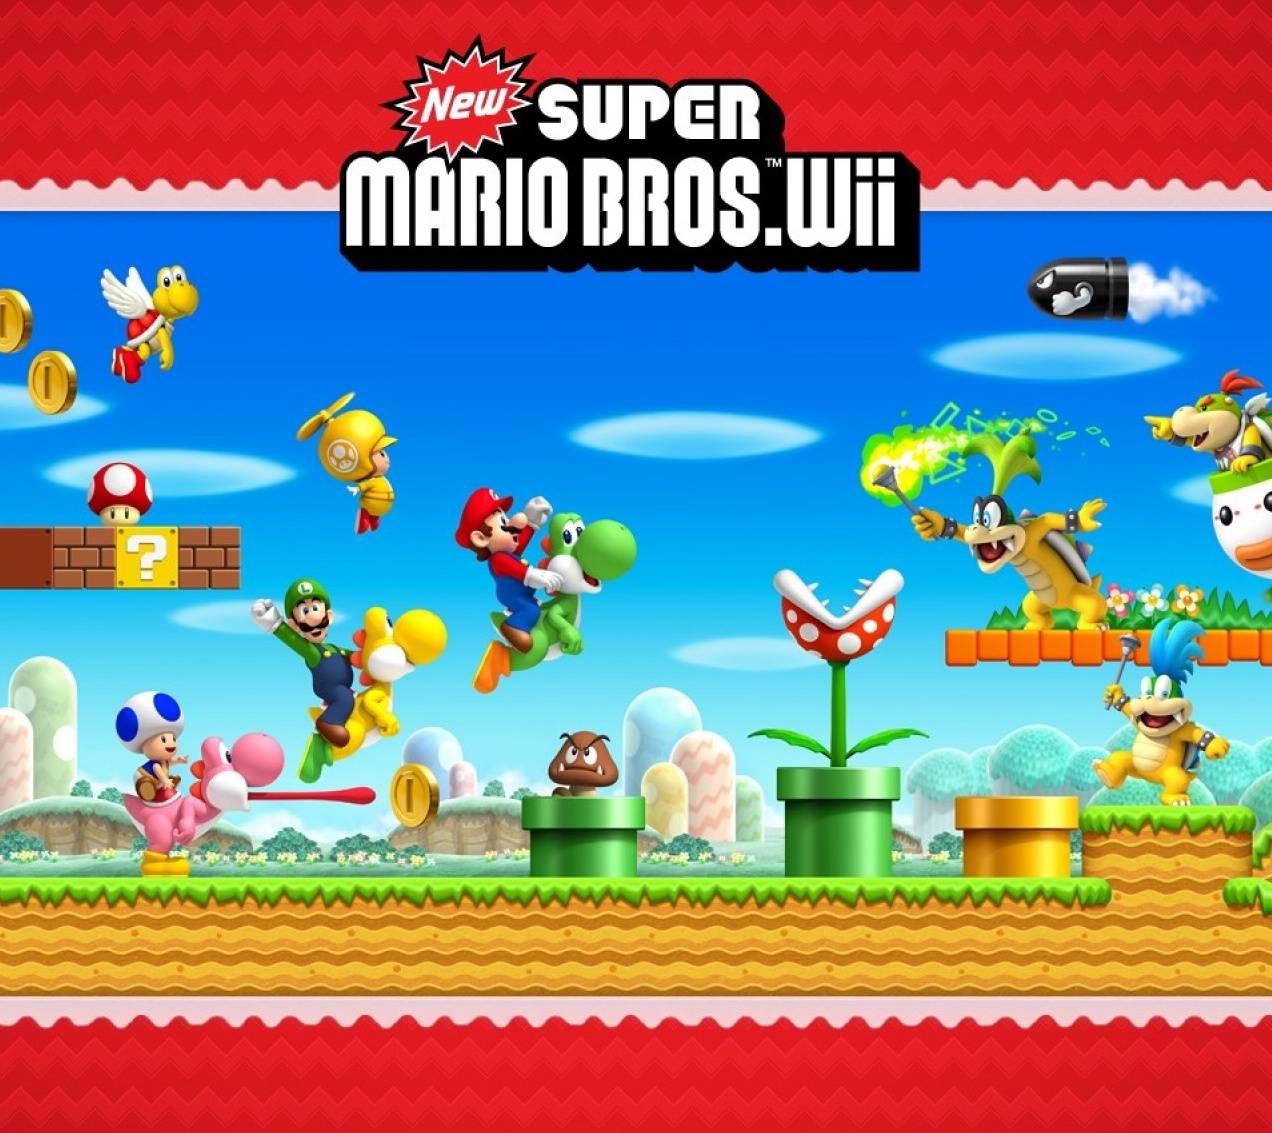 Super Mario Bros Wii Wallpaper By Luigyh E7 Free On Zedge